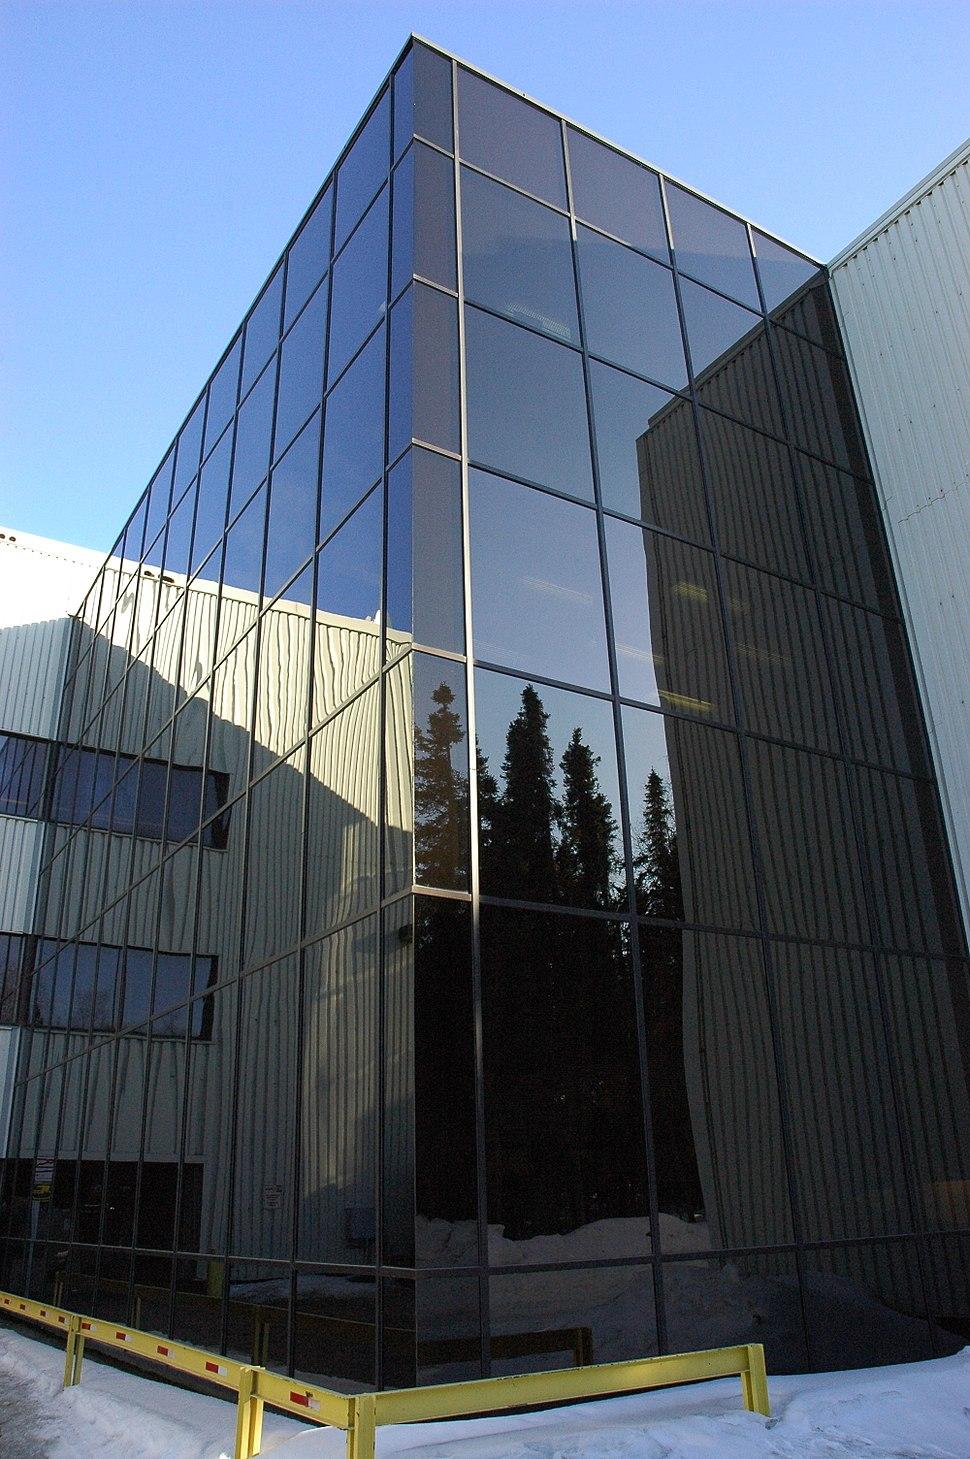 Consortium Library University of Alaska Anchorage